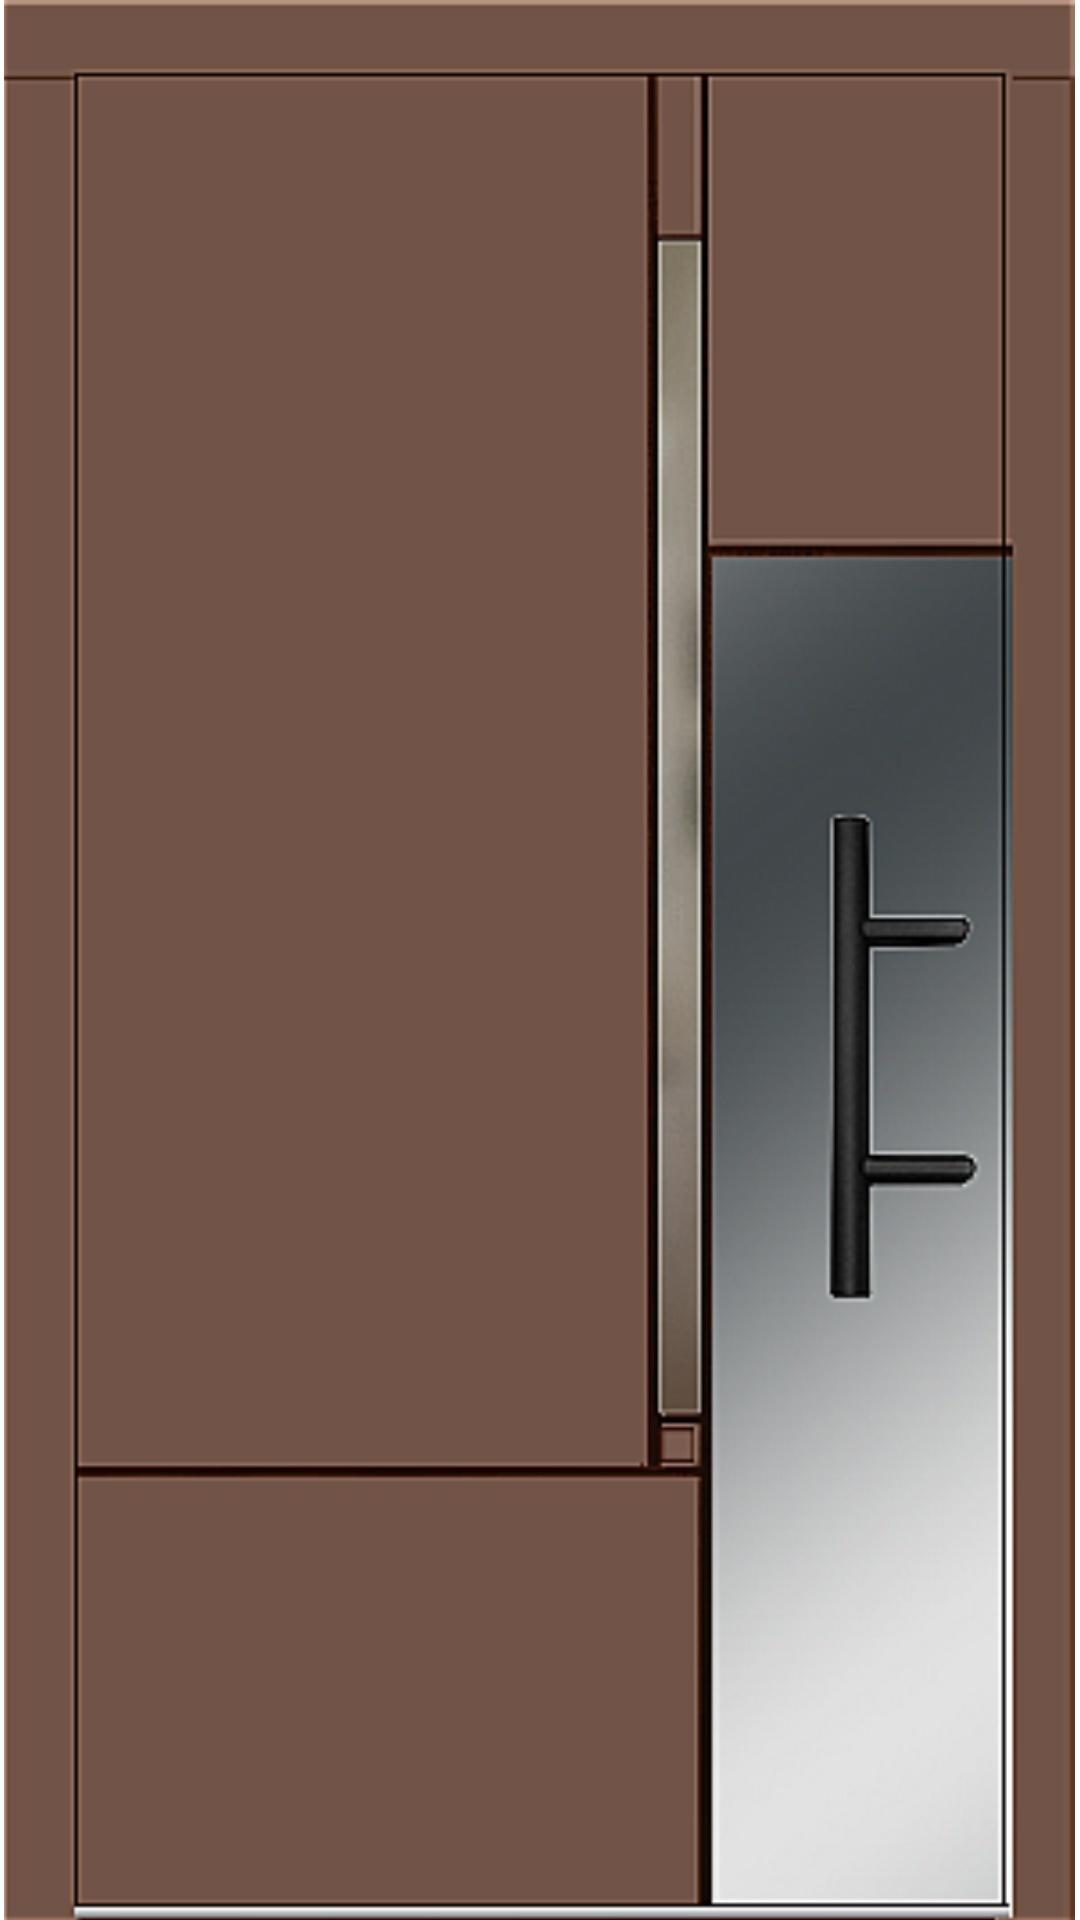 Holz Haustür Modell 8380 lehmbraun